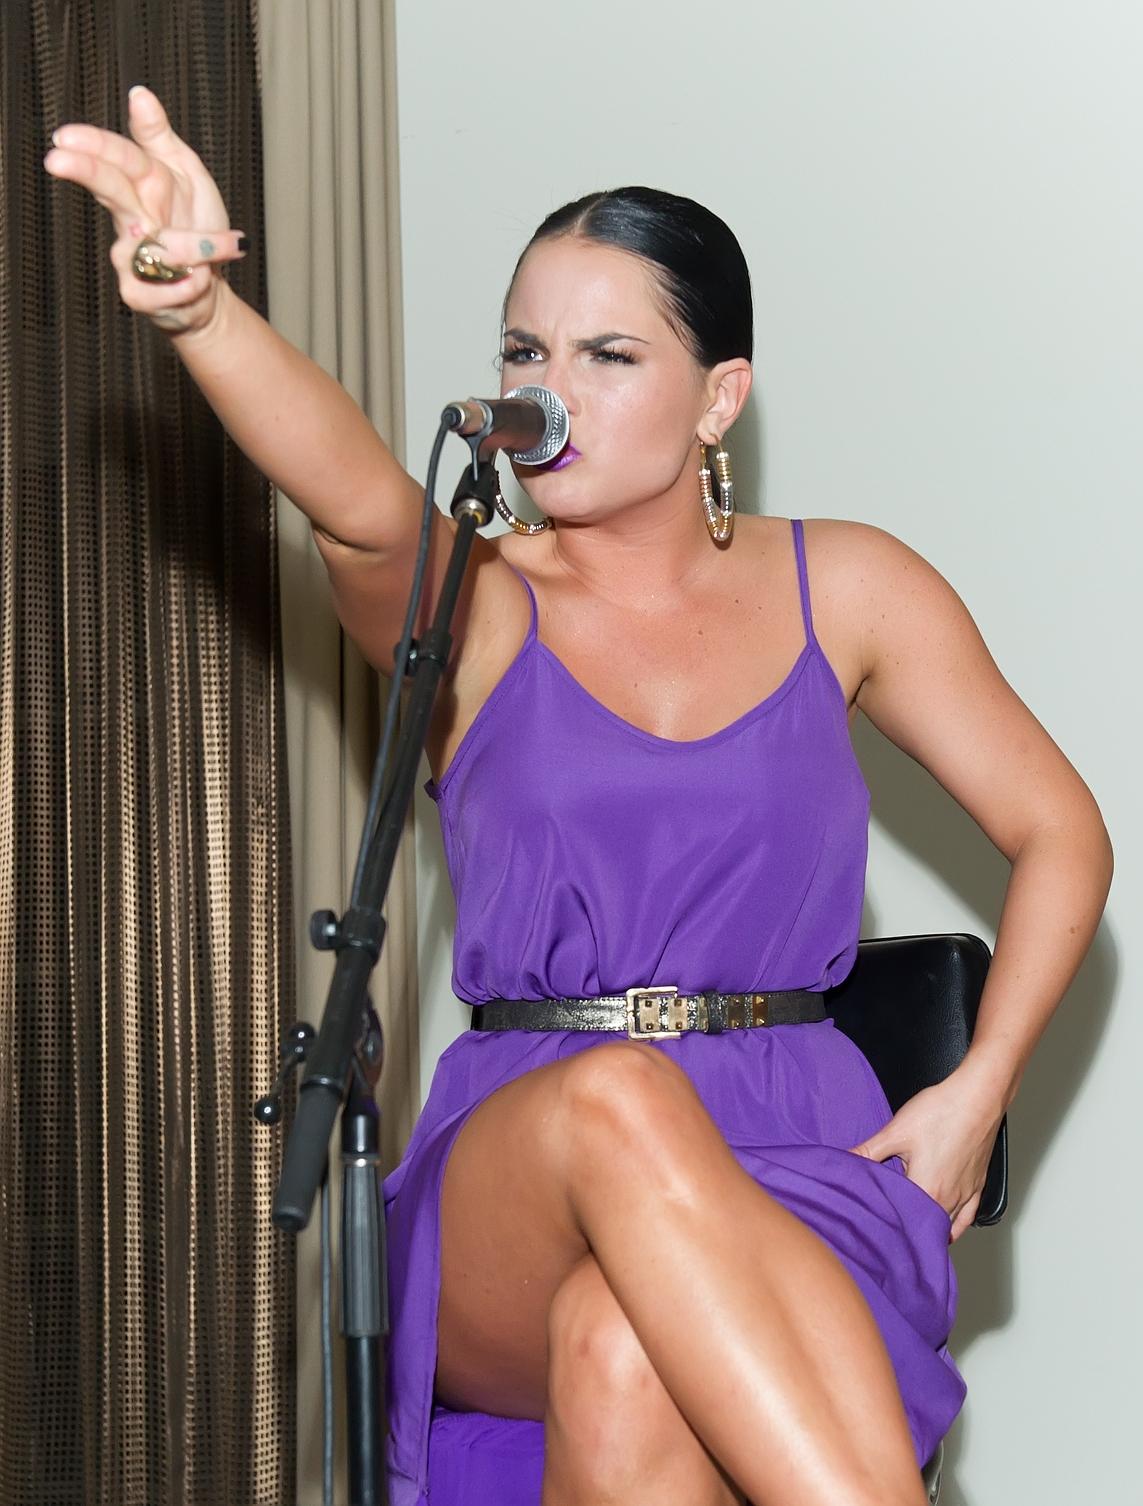 Joanna jojo levesque sexy singles concert in philadelphia joanna jojo levesque hot wallpaper voltagebd Images